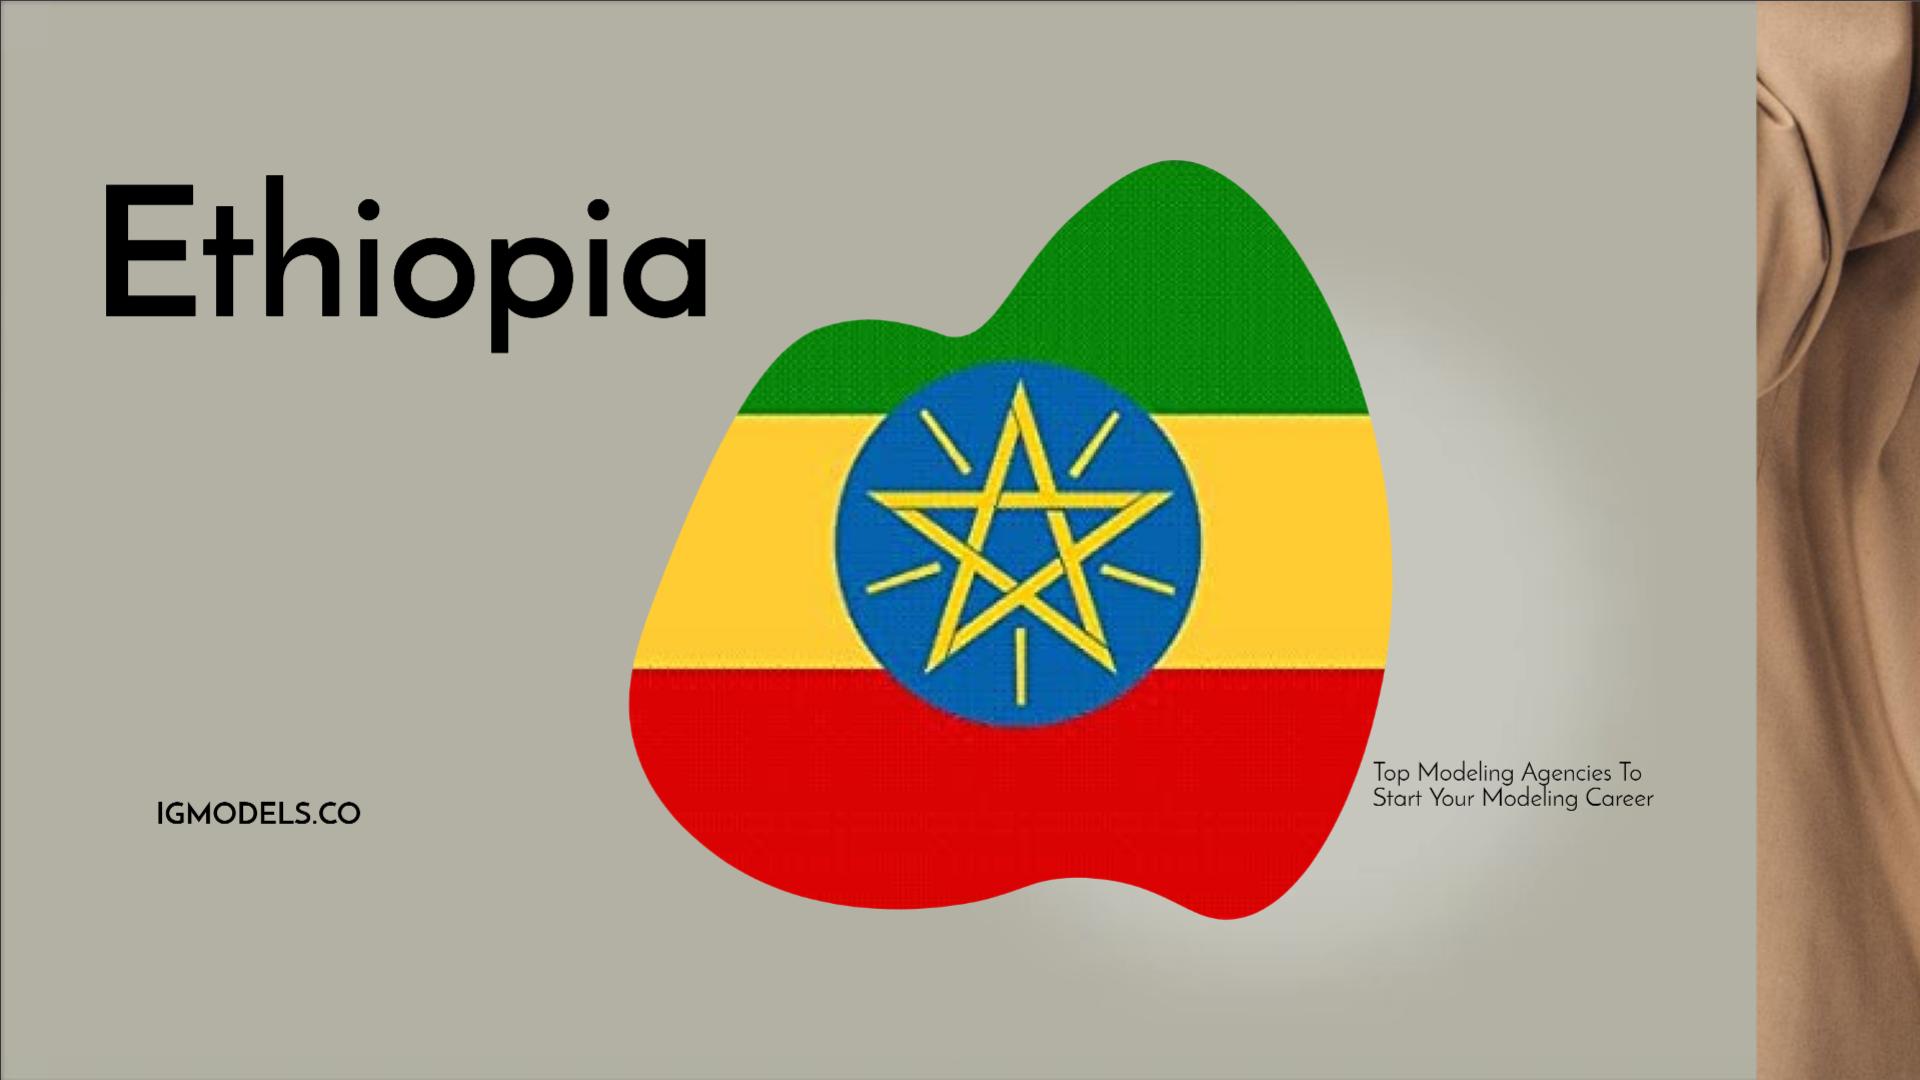 List : Top 35 Modeling Agencies In Ethiopia To Start Your Modeling Career In 2021